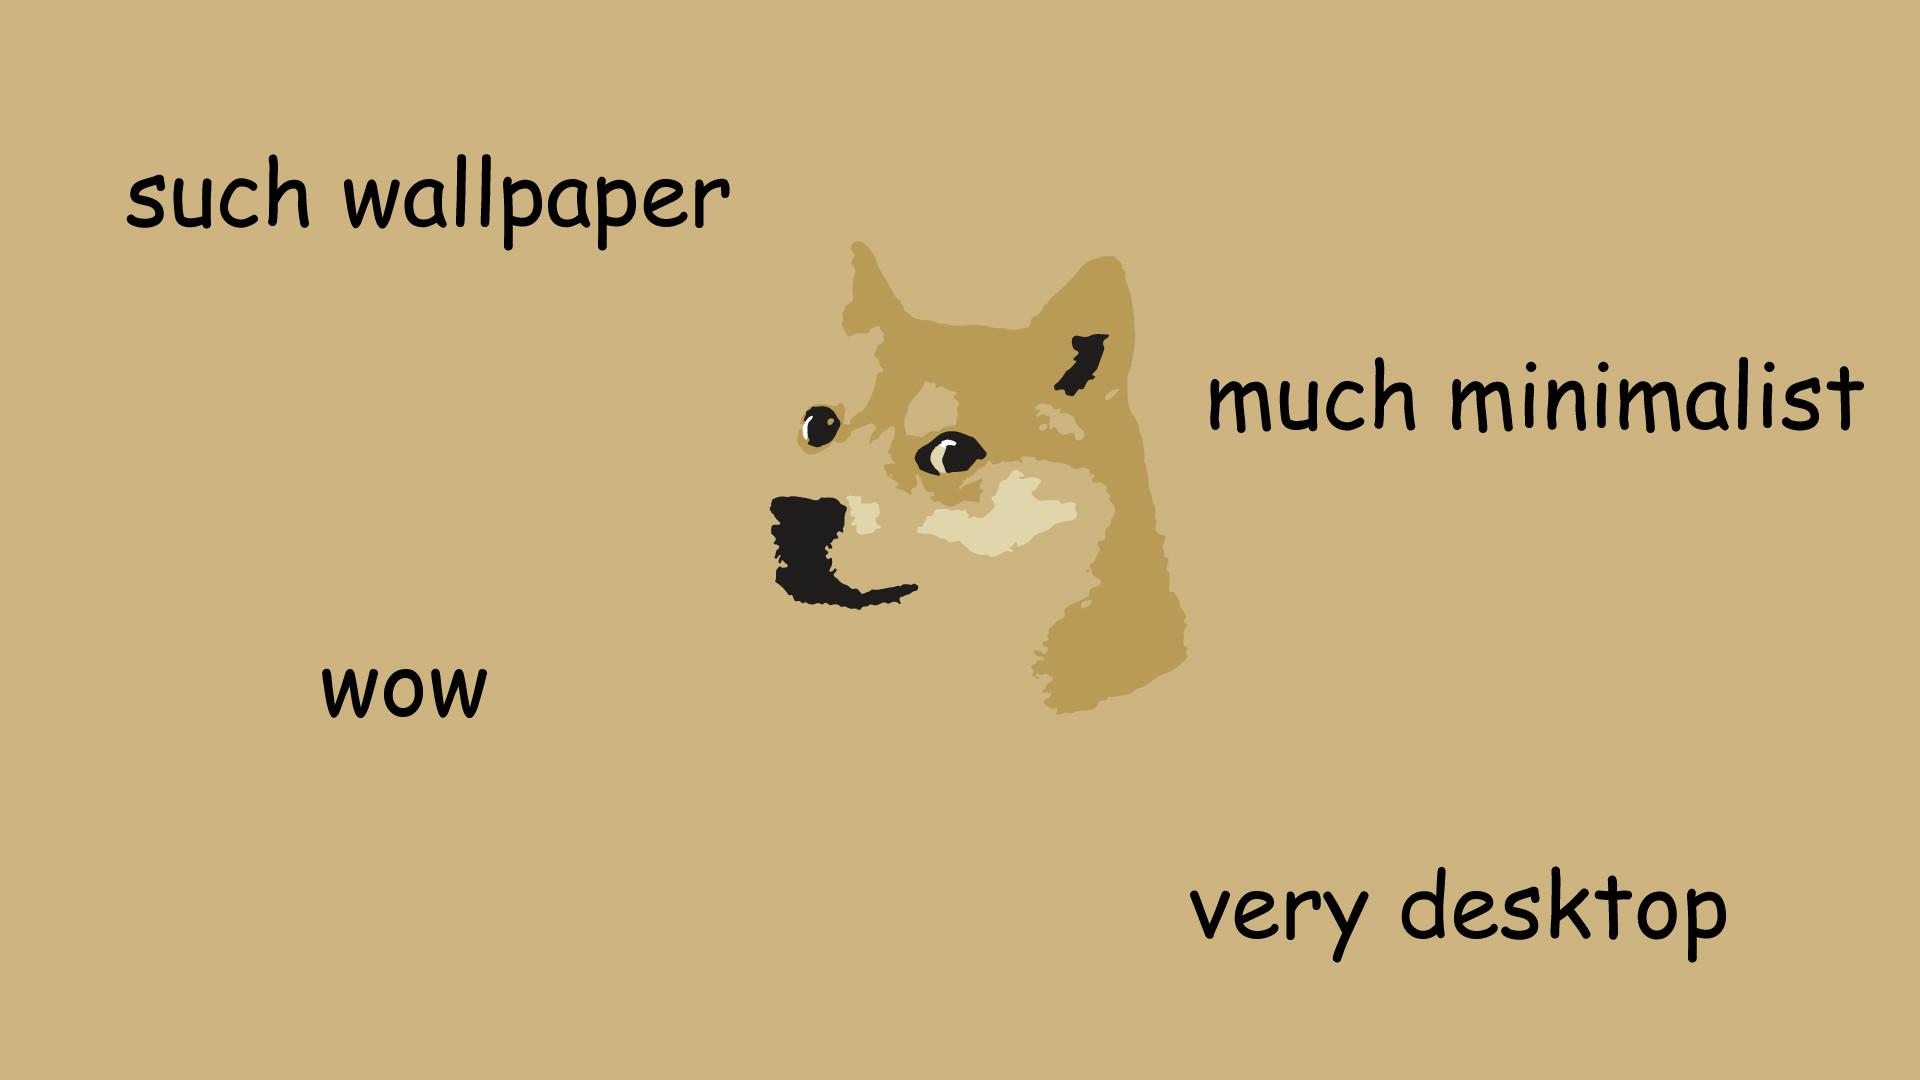 Doge S Wallpaper ID: Doge Wallpaper Wallpapers)